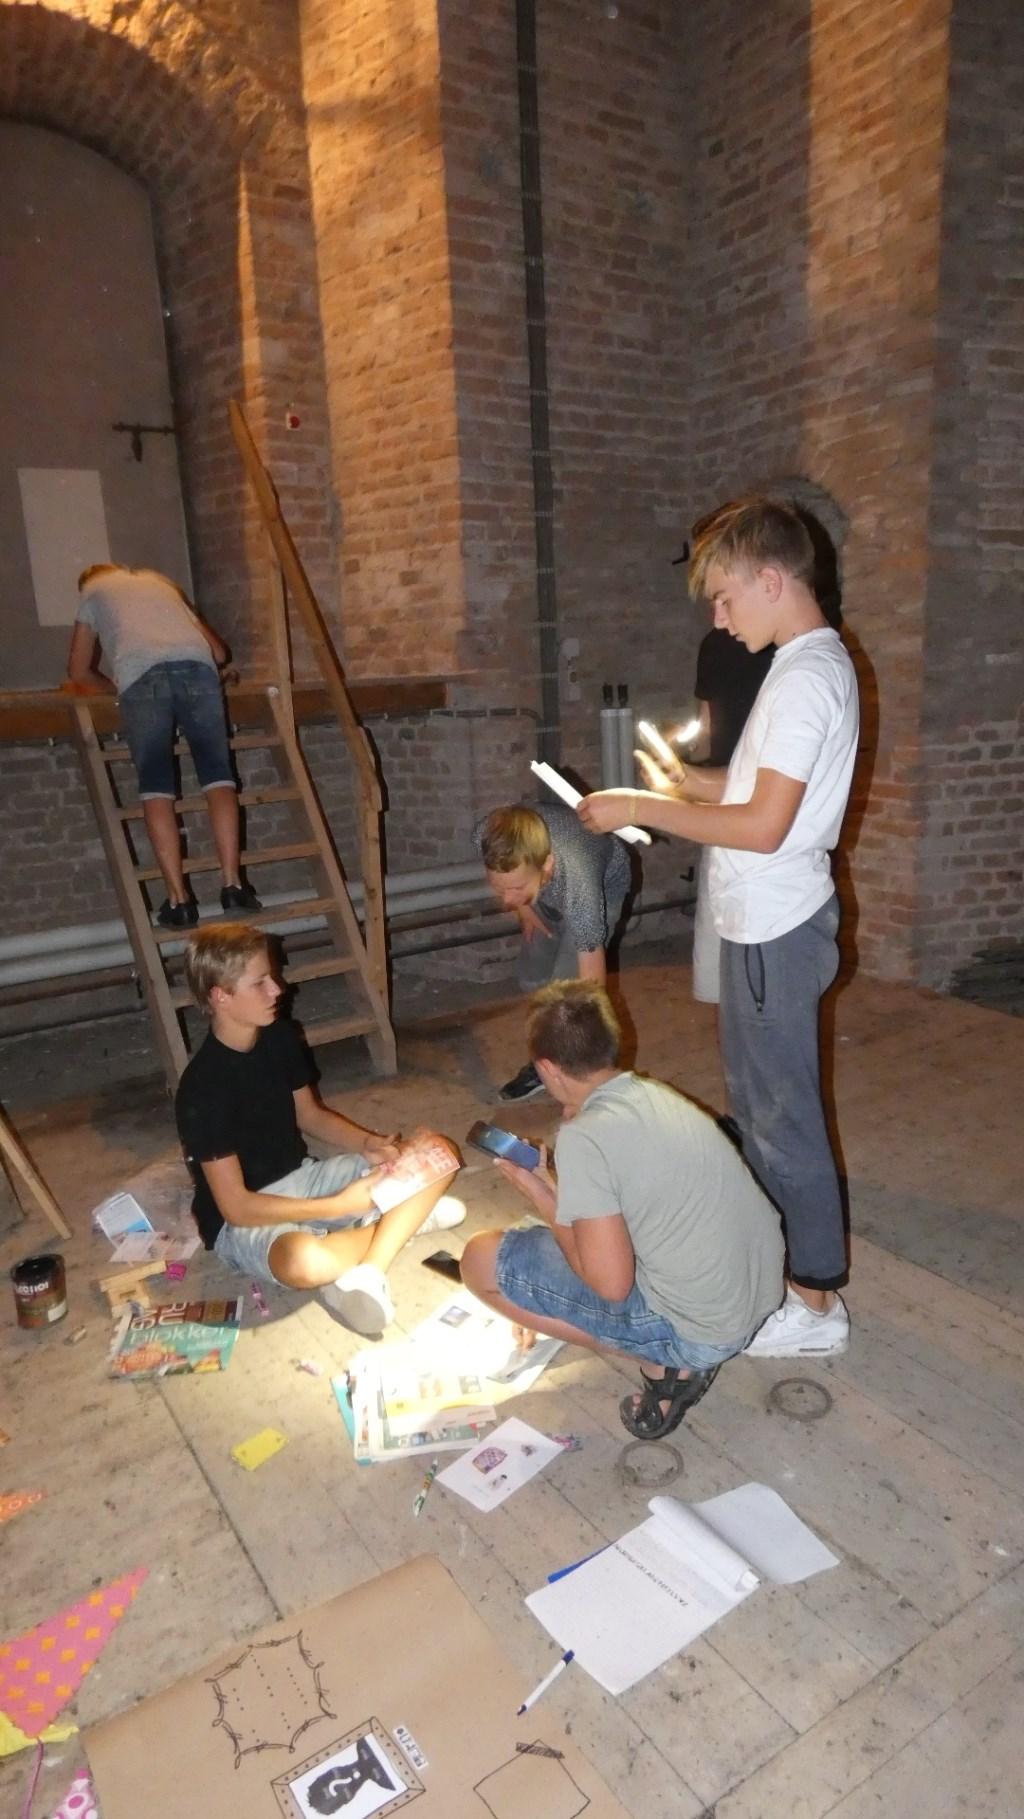 Avondprogramma Excape Room Foto: Nelleke Brenkman © Persgroep